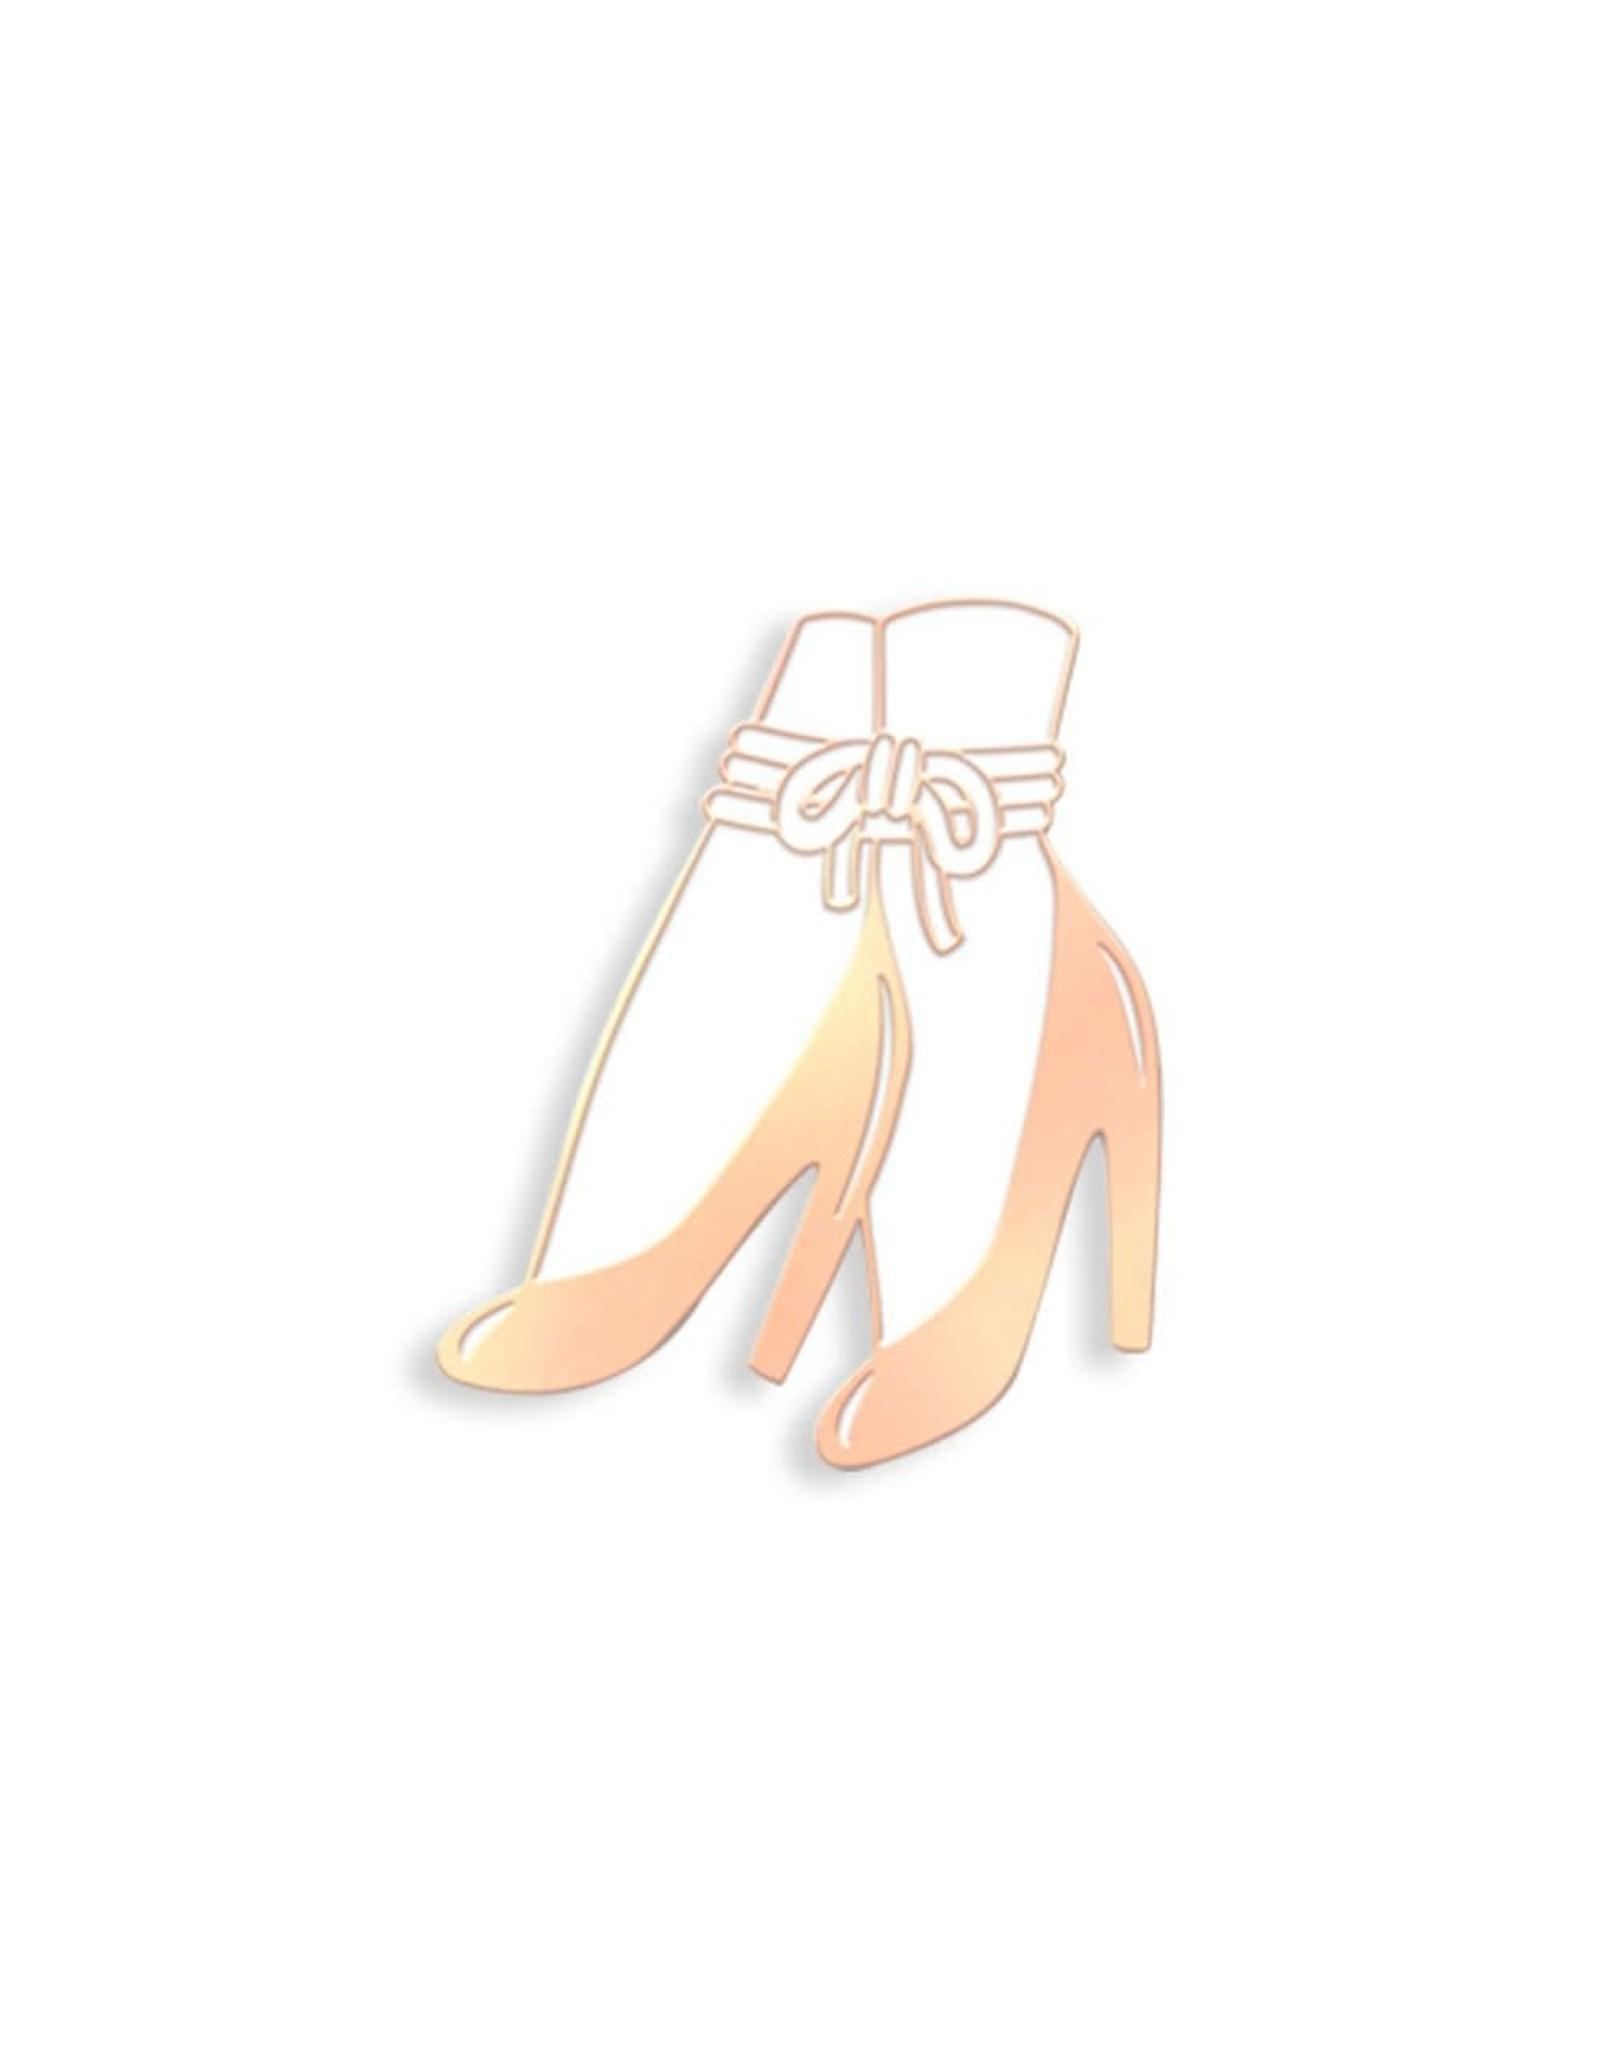 Enamel Pin Bound Ankles Heels Enamel Pin